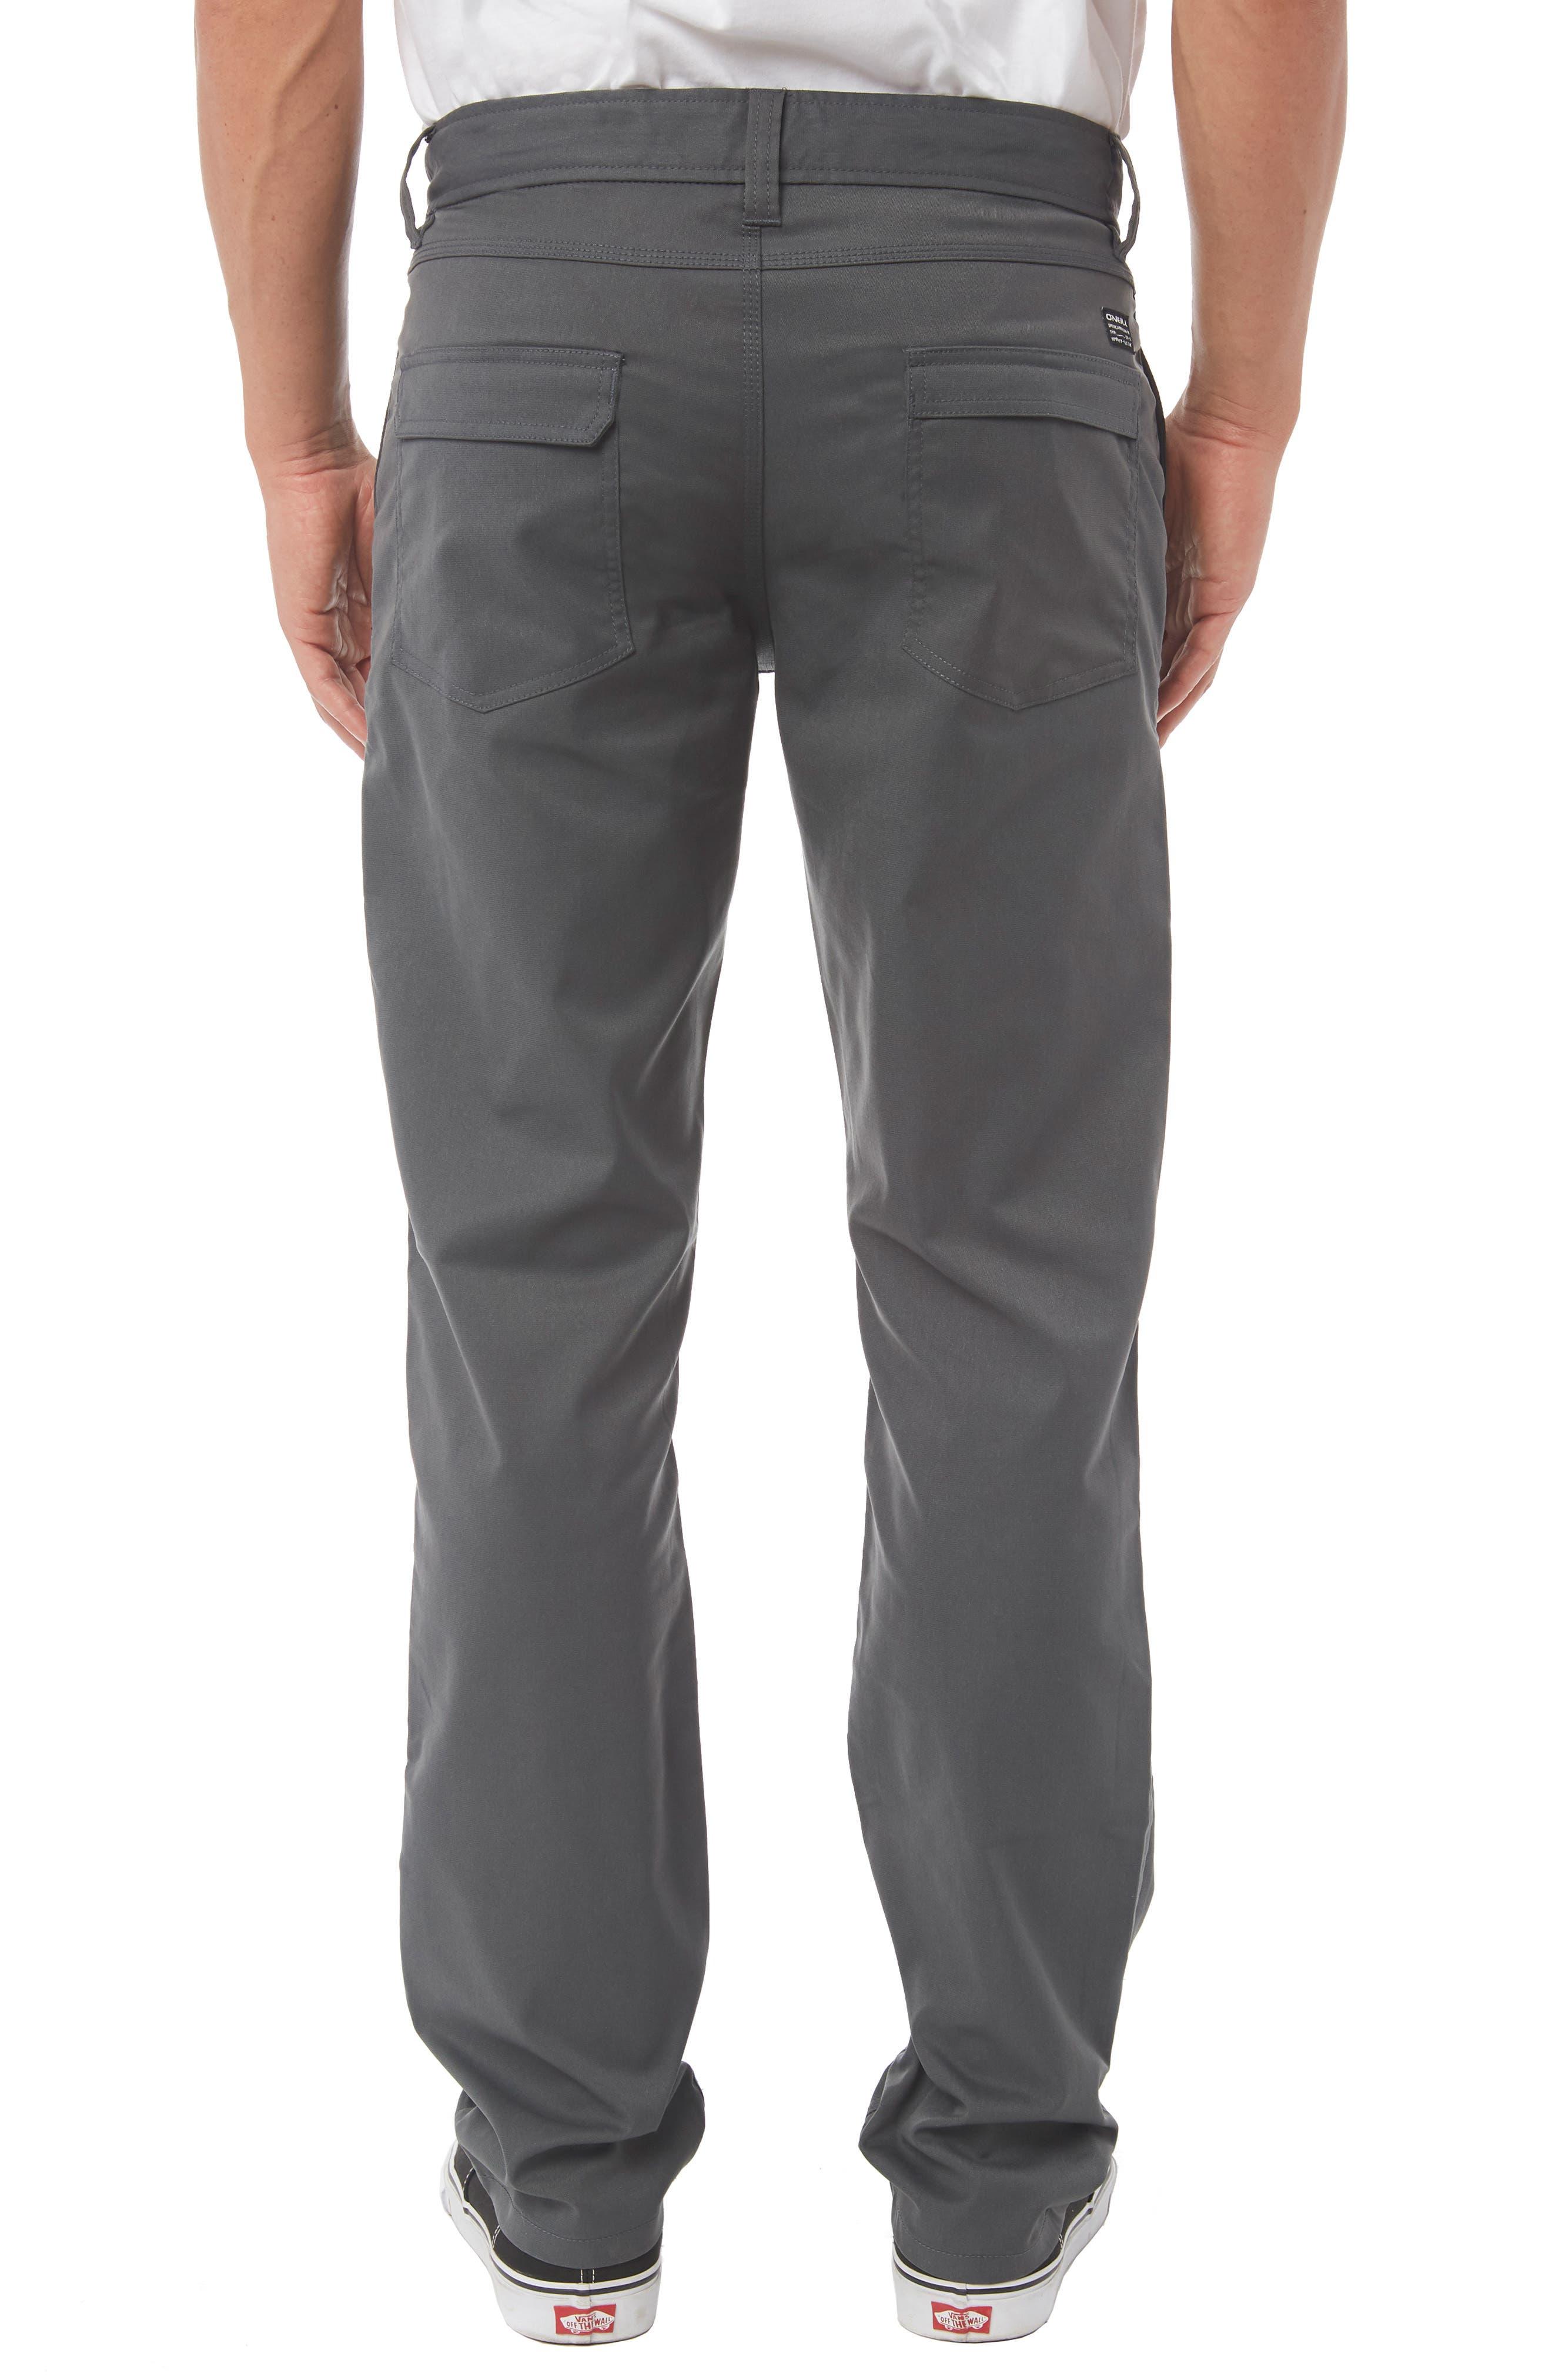 Redlands Hybrid Performance Pants,                             Alternate thumbnail 2, color,                             DARK FATIGUE